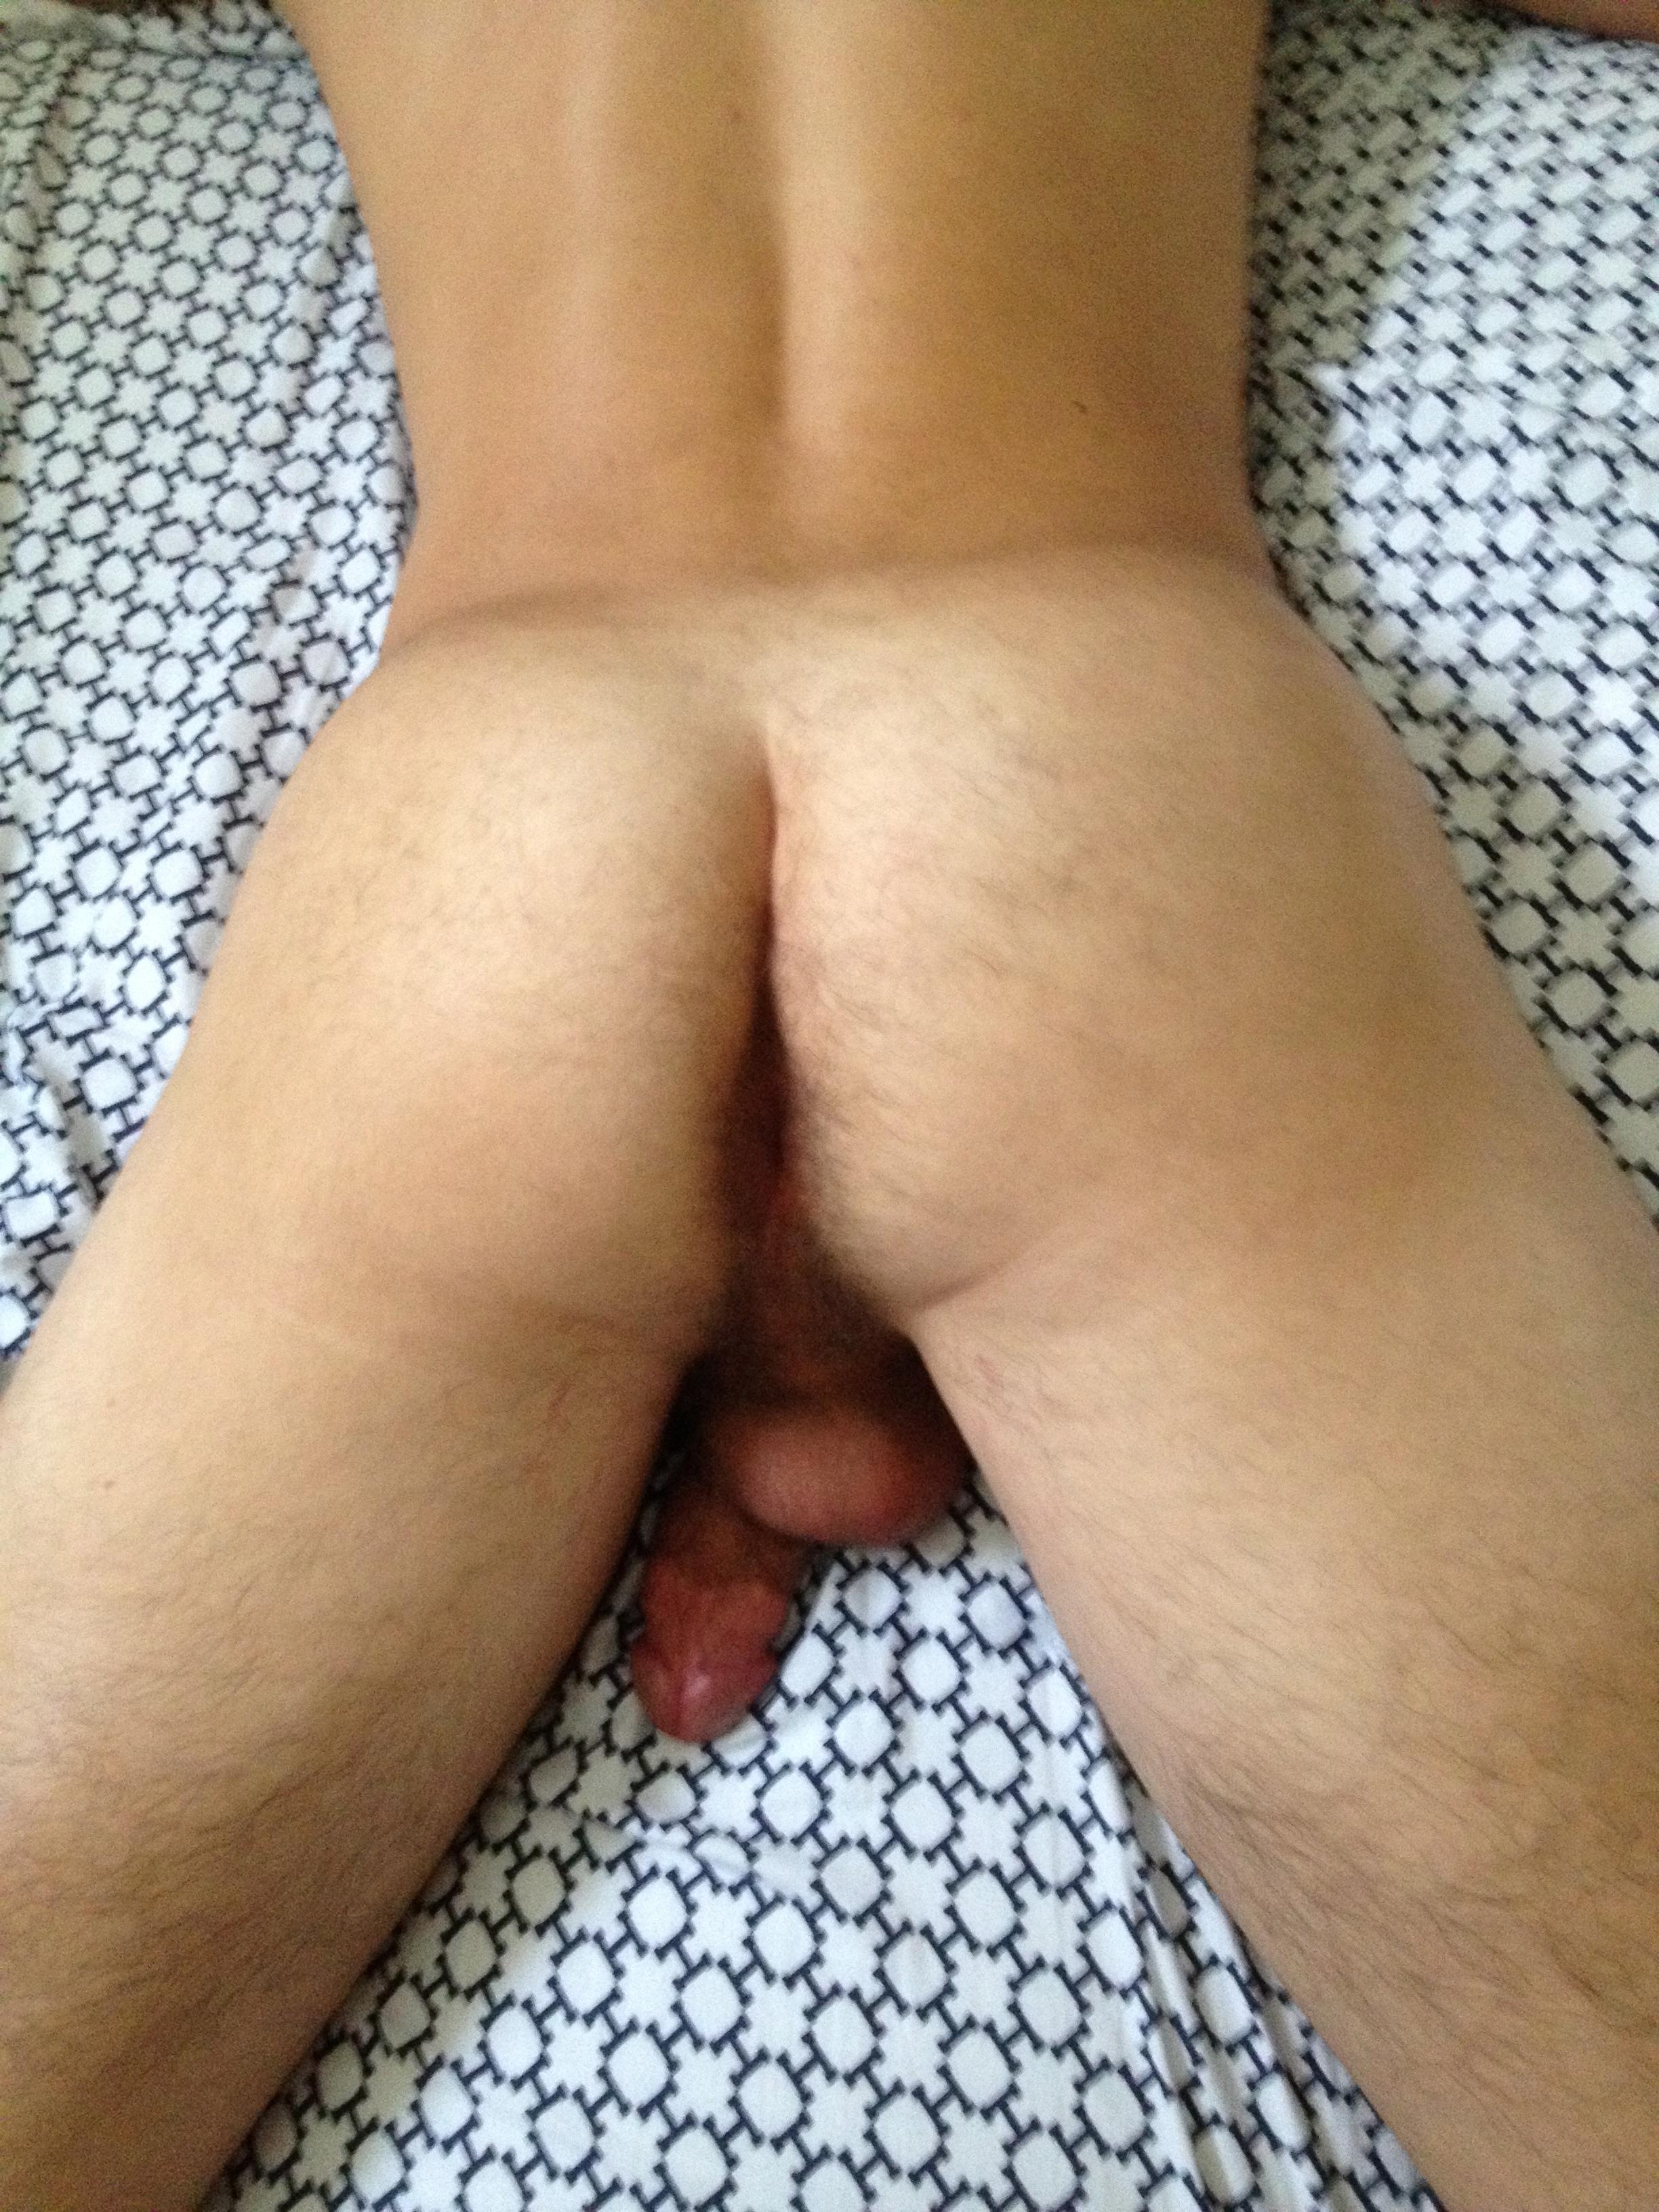 hornyboy314